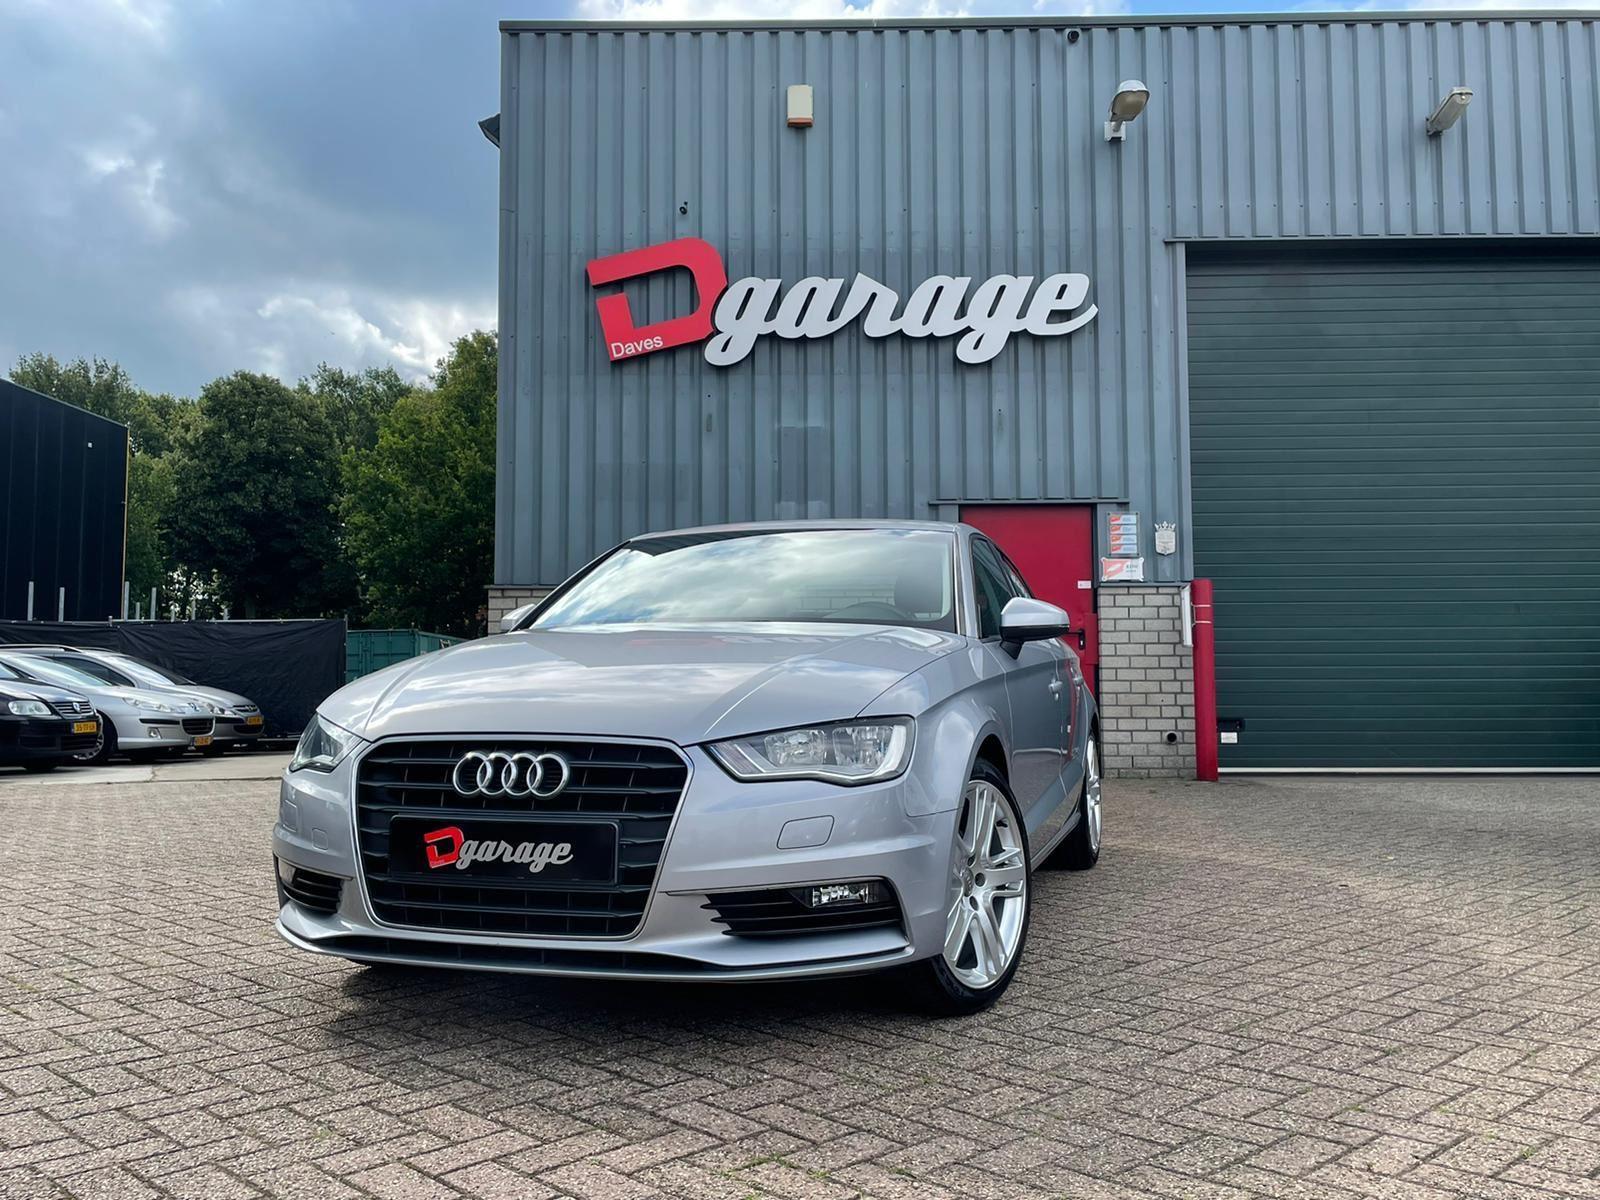 Audi A3 Limousine occasion - Dave's Garage